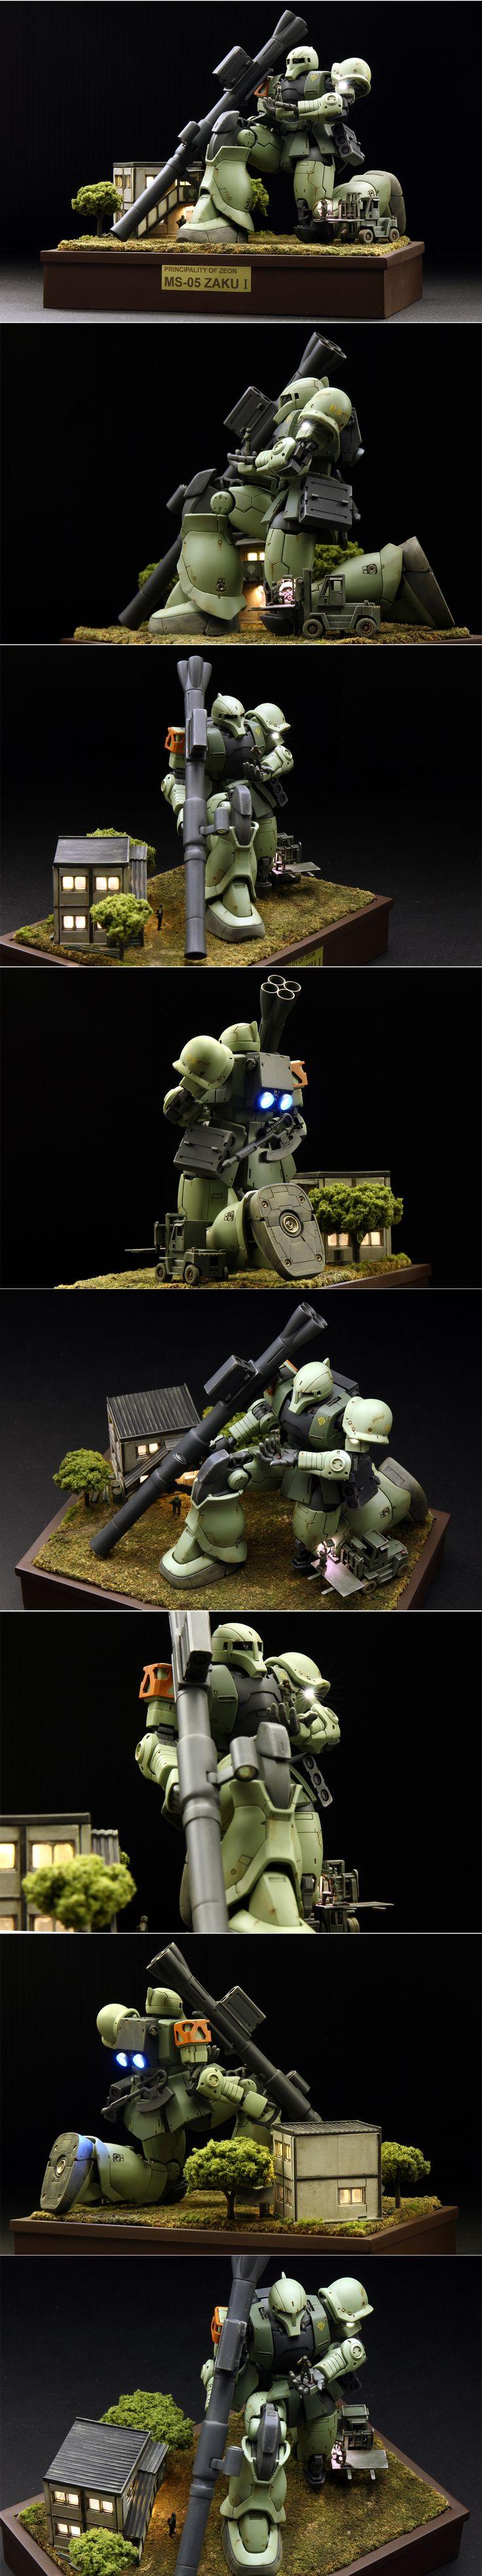 HG 1/144 THE ORIGIN ザクI 塗装済完成品 オリジン - ヤフオク!